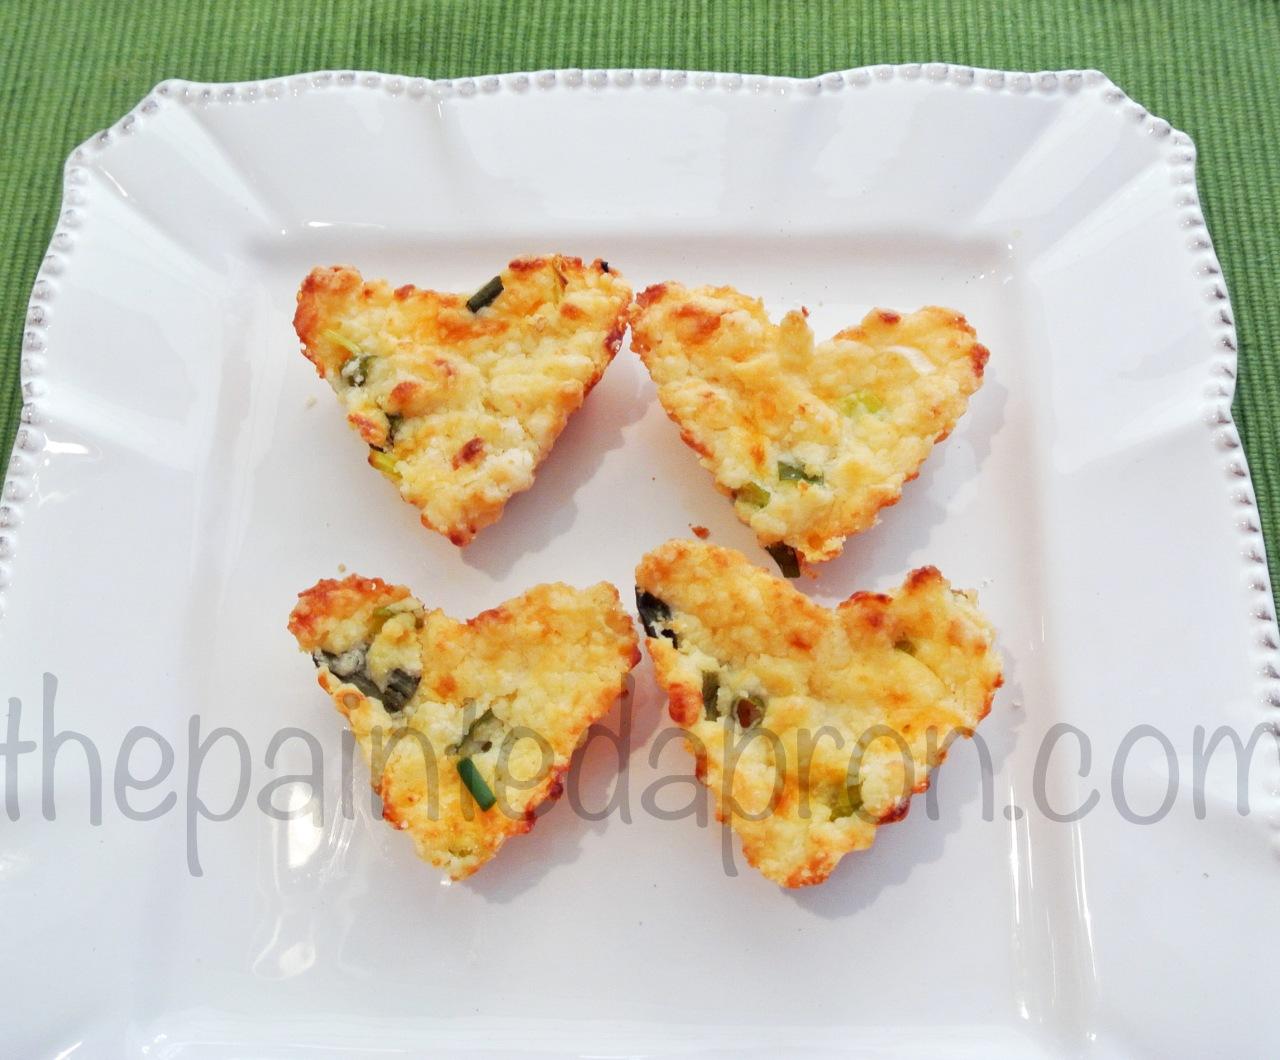 cheese hearts 2 thepaintedapron.com